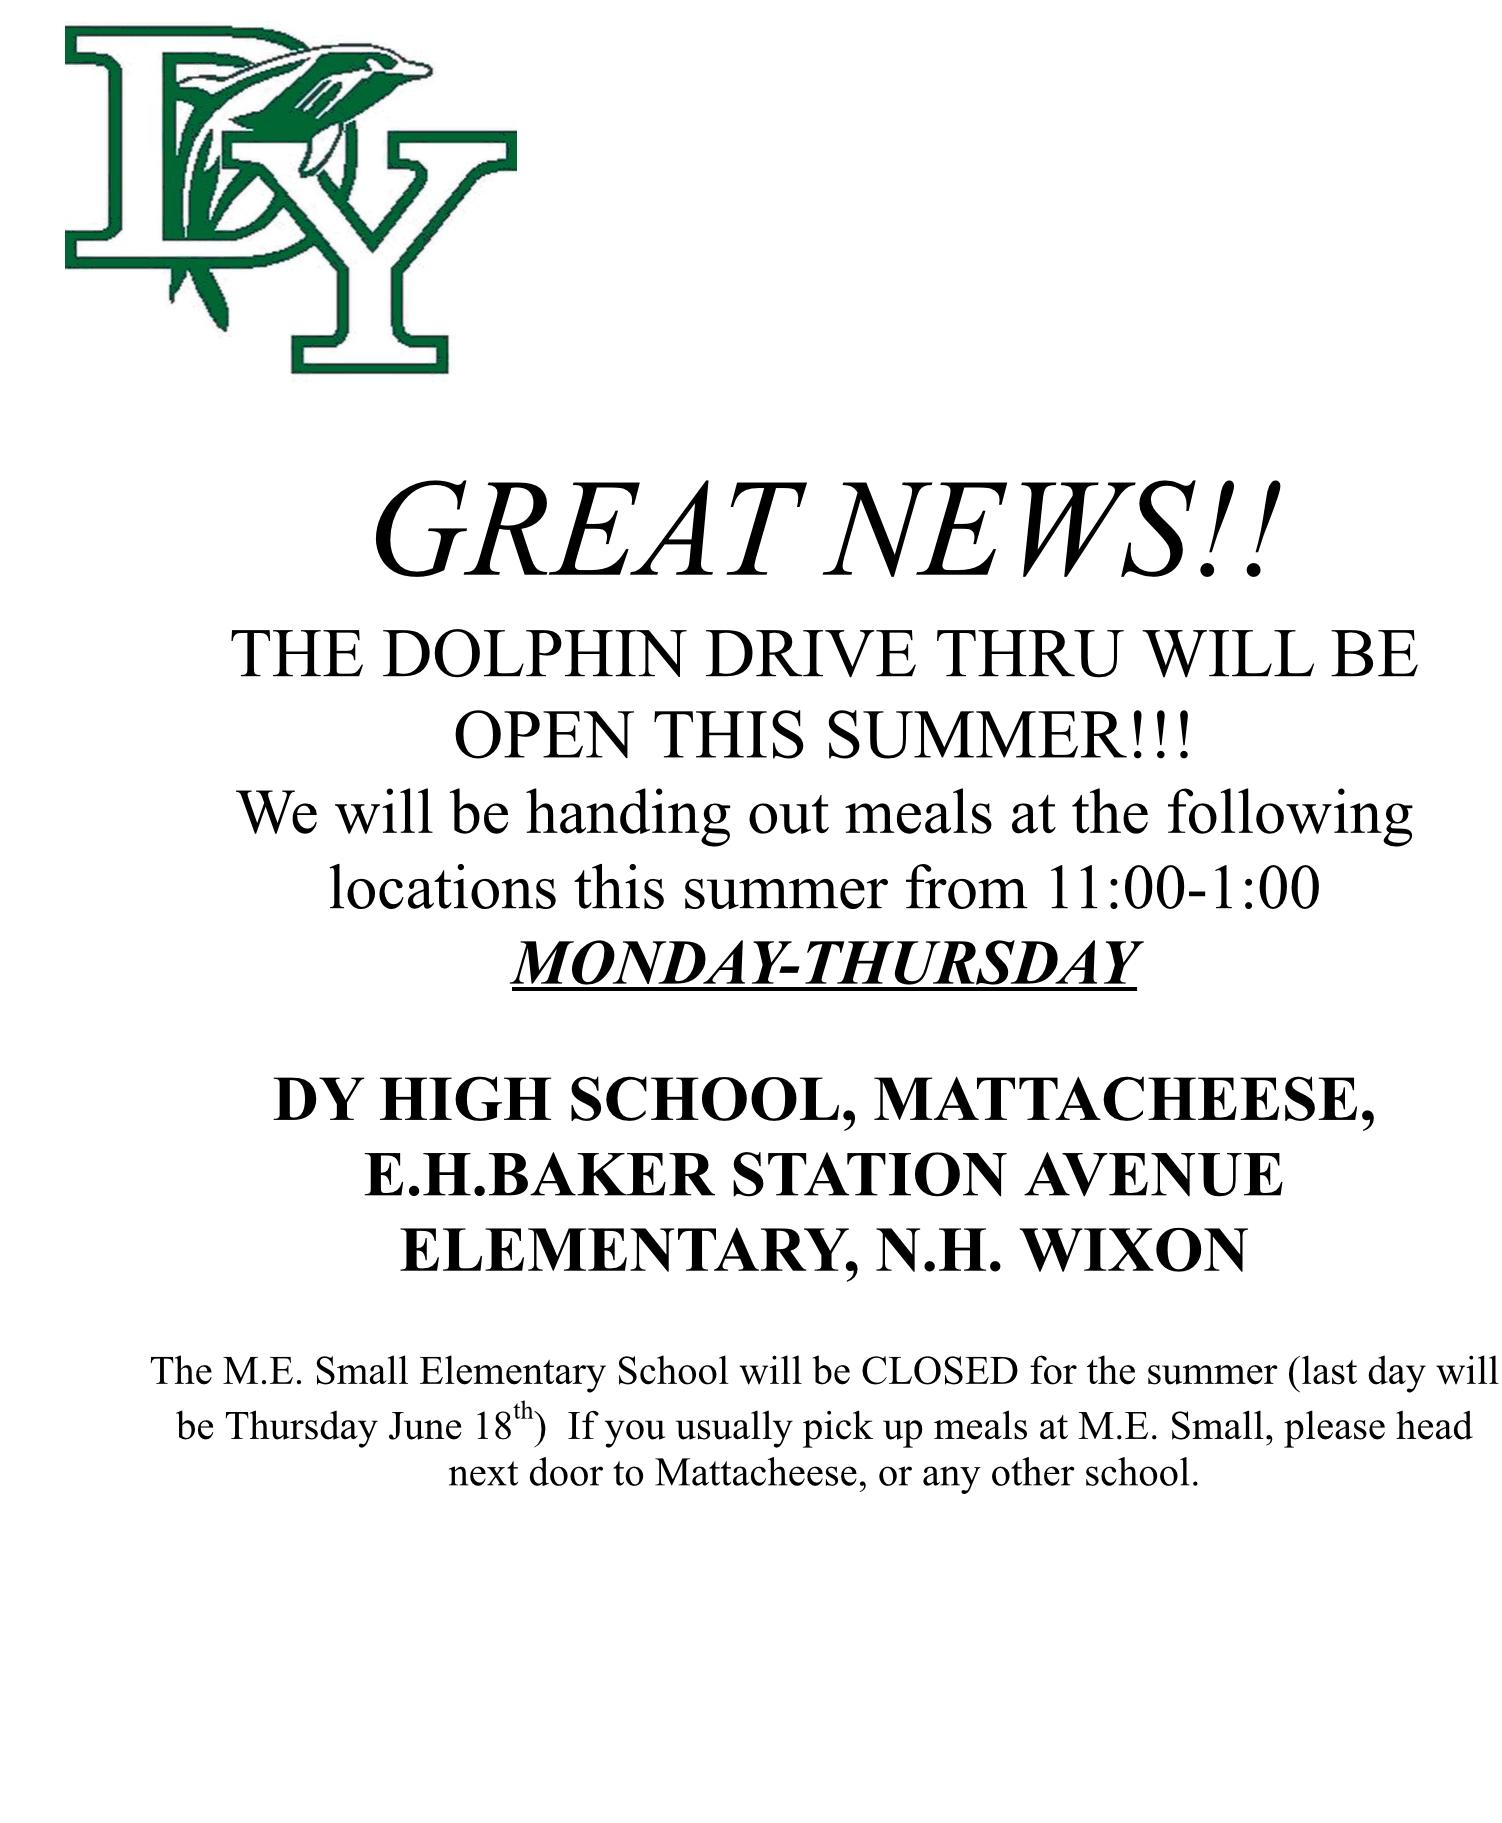 Dolphin Drive Through Summer